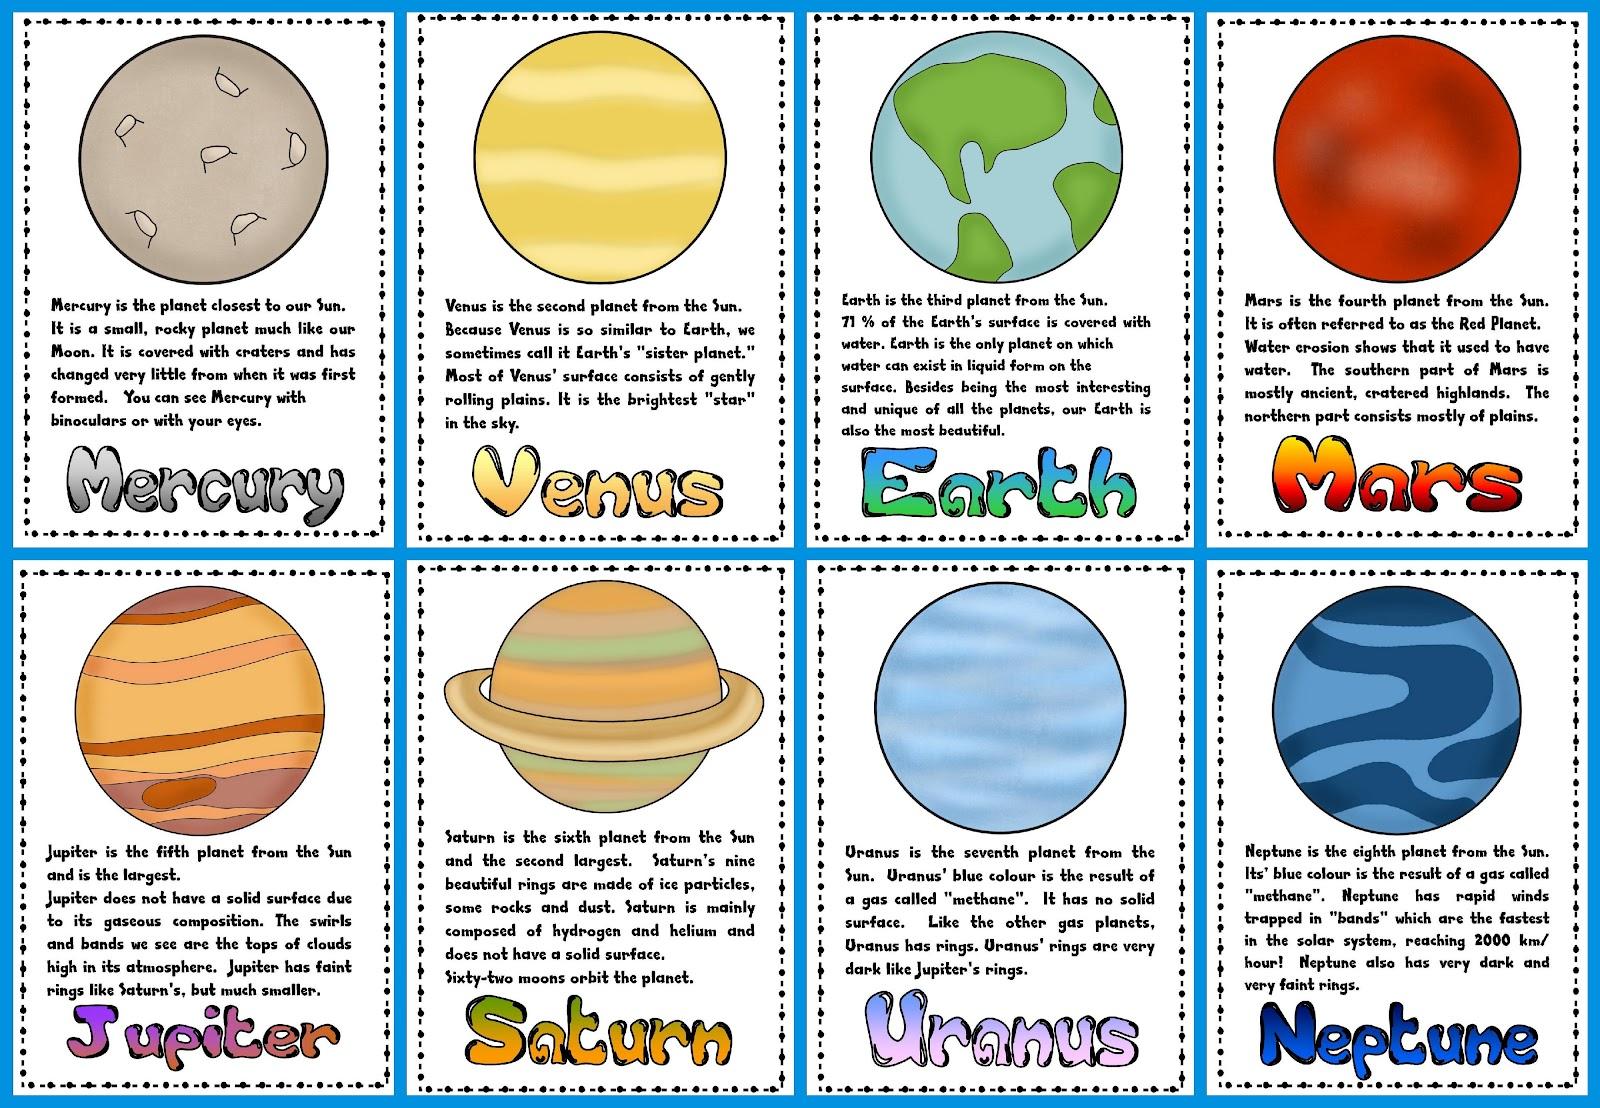 solar system clipart kindergarten 20 free cliparts download images on clipground 2019. Black Bedroom Furniture Sets. Home Design Ideas